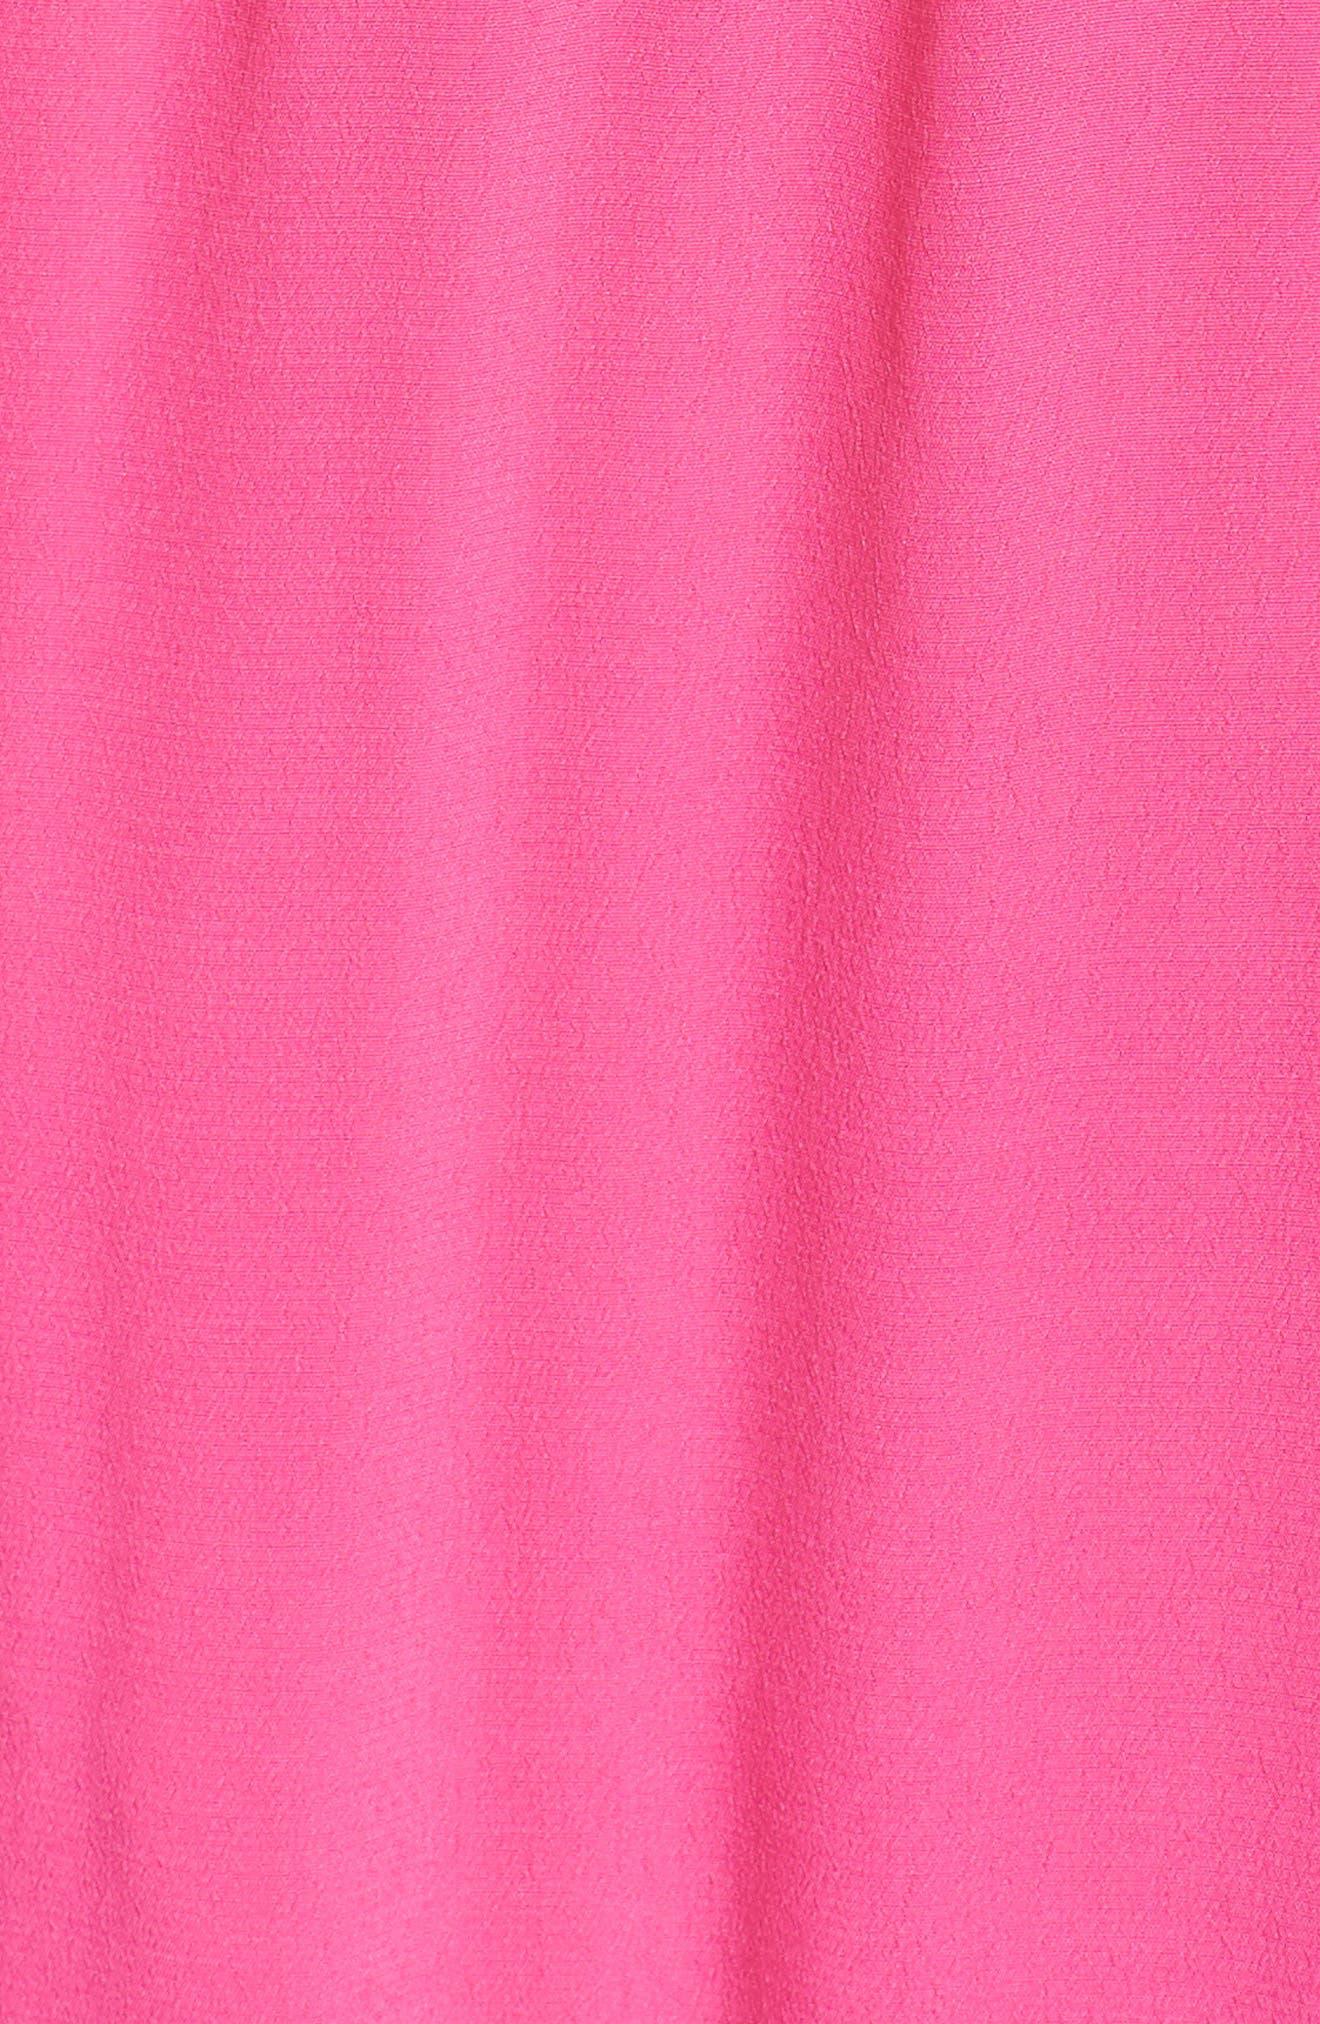 Cold Shoulder Maxi Dress,                             Alternate thumbnail 5, color,                             660